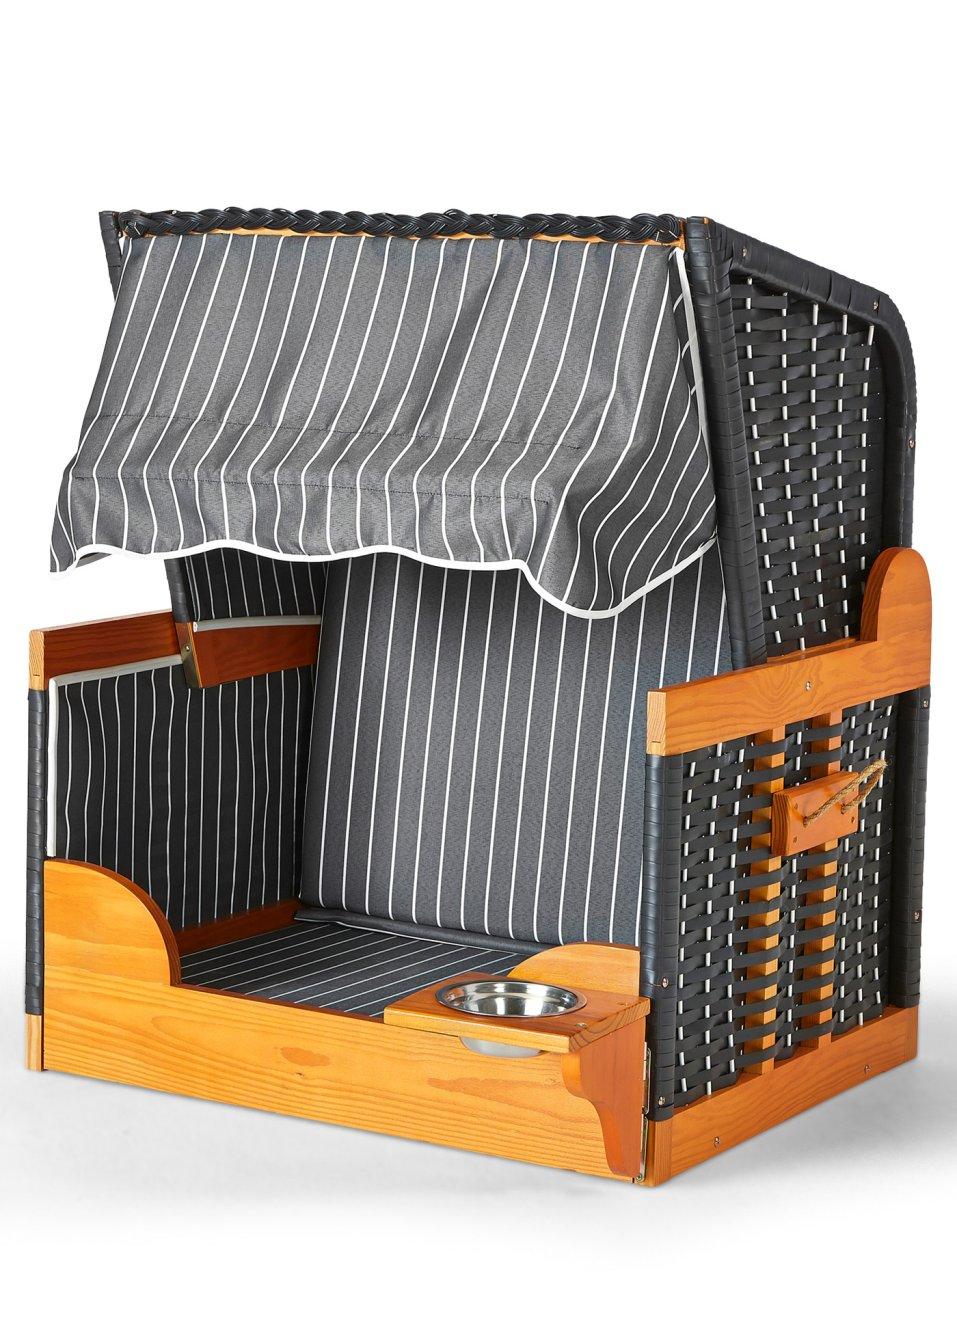 luxus f r den vierbeinigen liebling hunde strandkorb. Black Bedroom Furniture Sets. Home Design Ideas